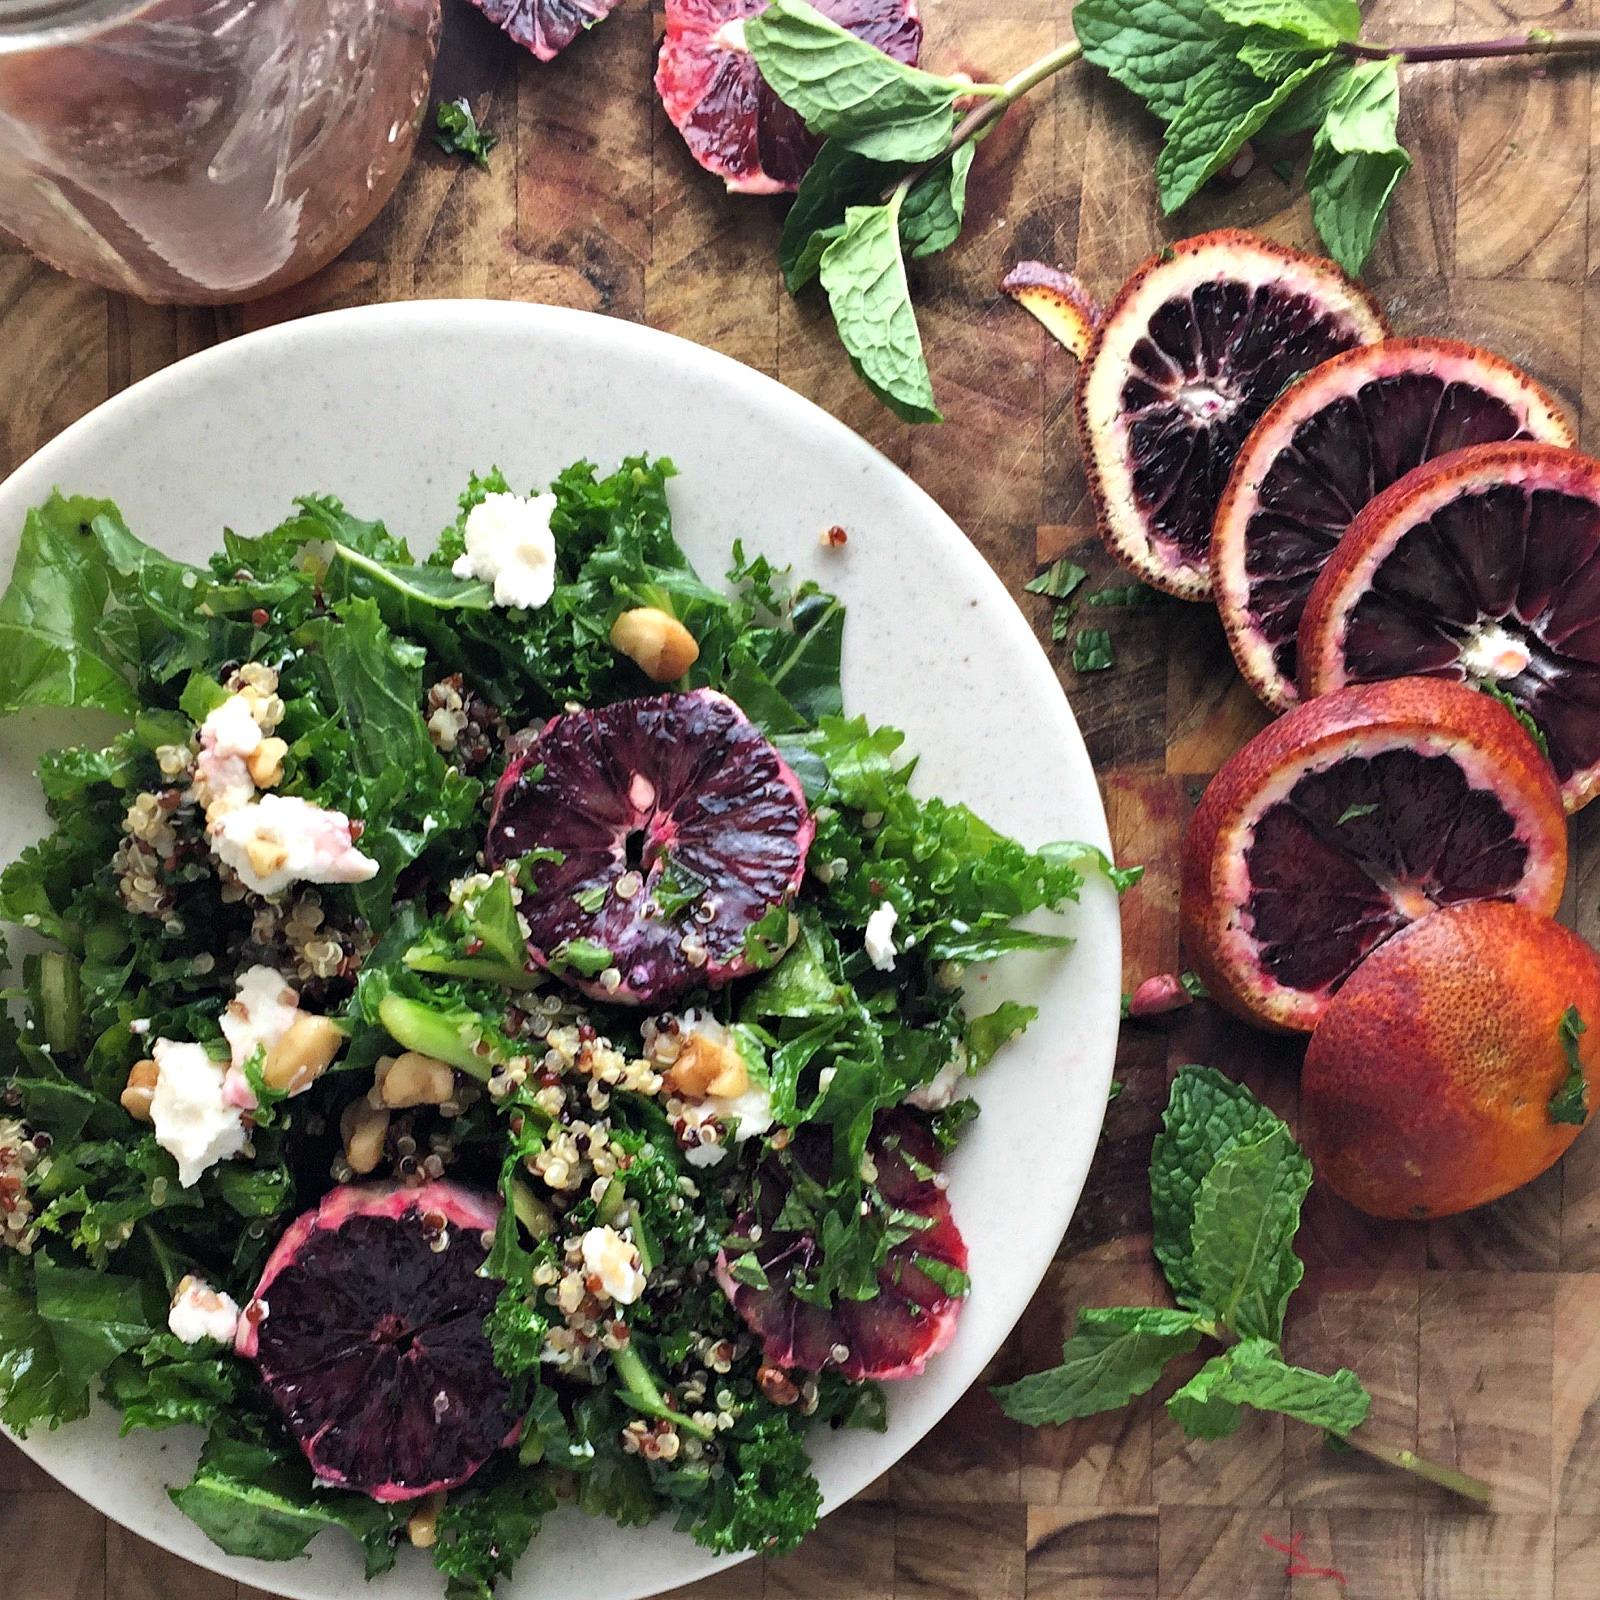 Kale, Quinoa and Walnut Salad with Blood Orange Vinaigrette